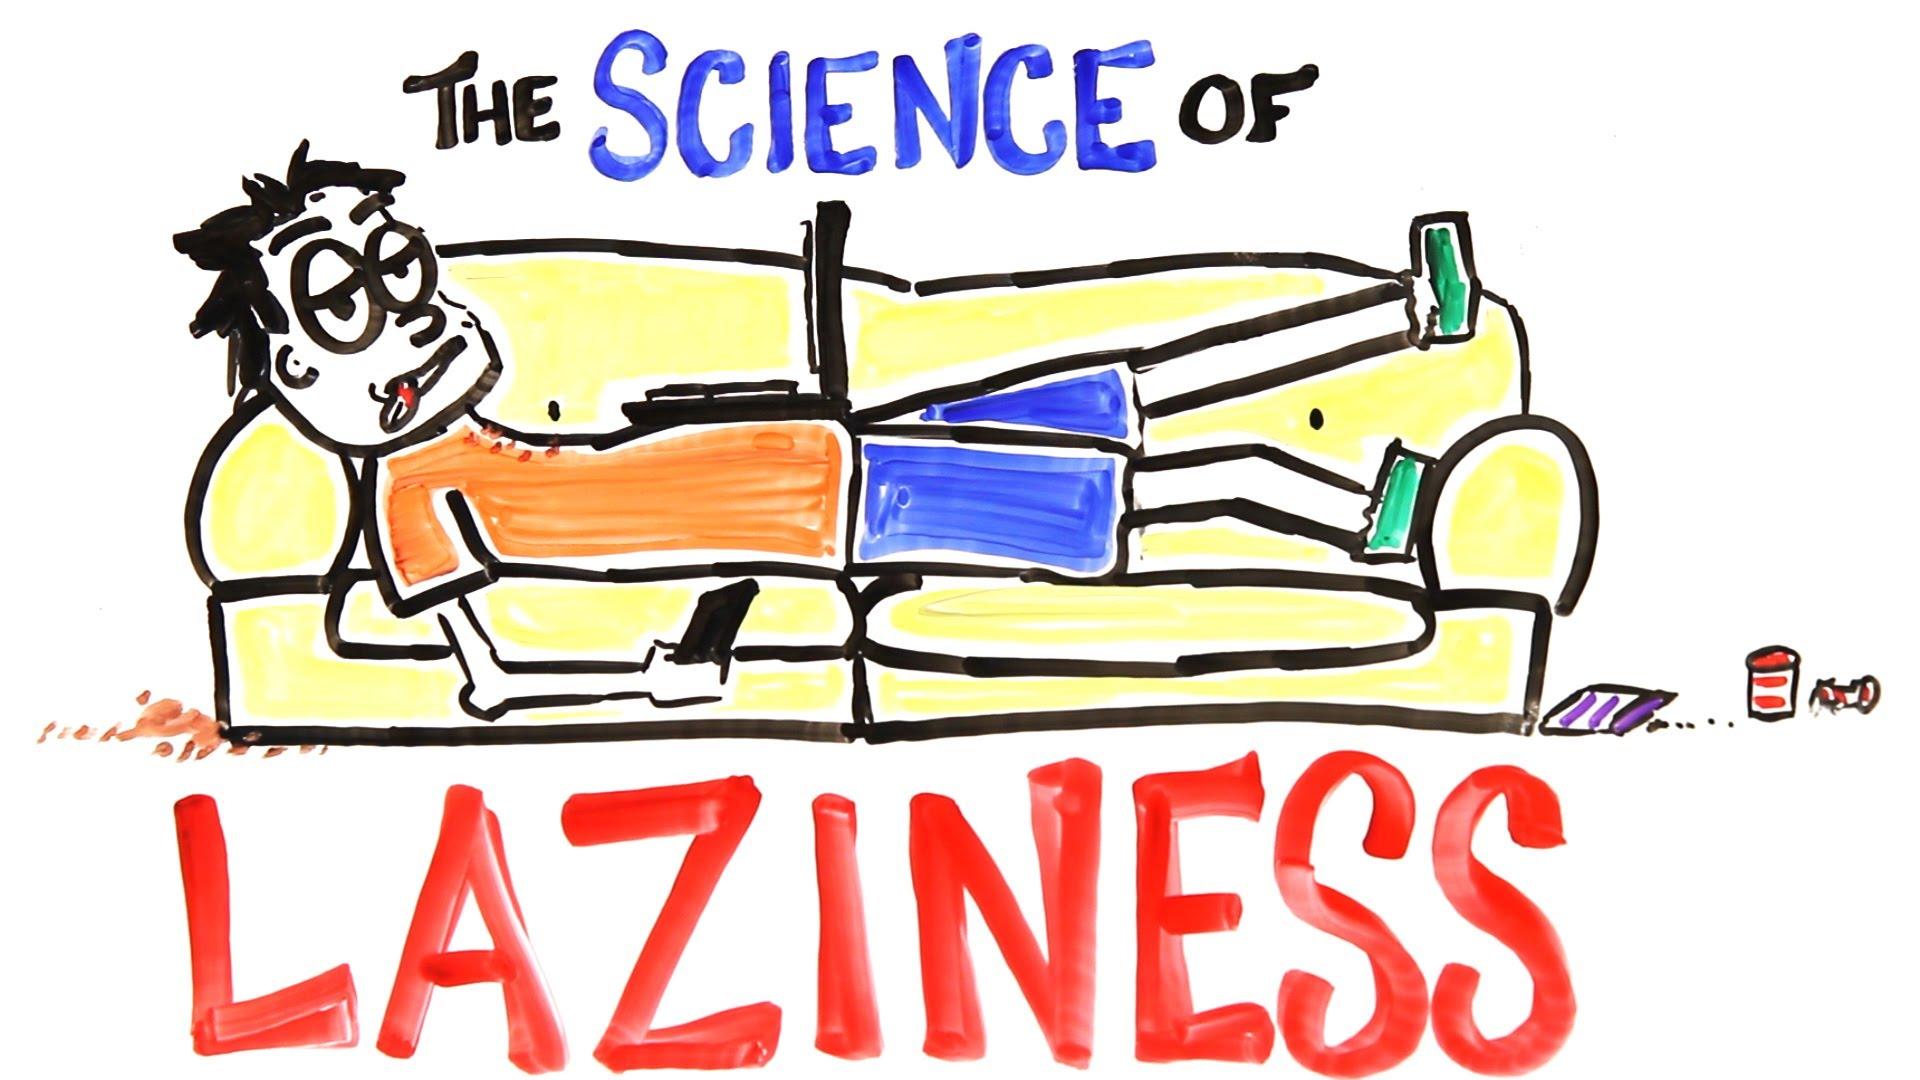 「懶惰的科學」- The Science of Laziness